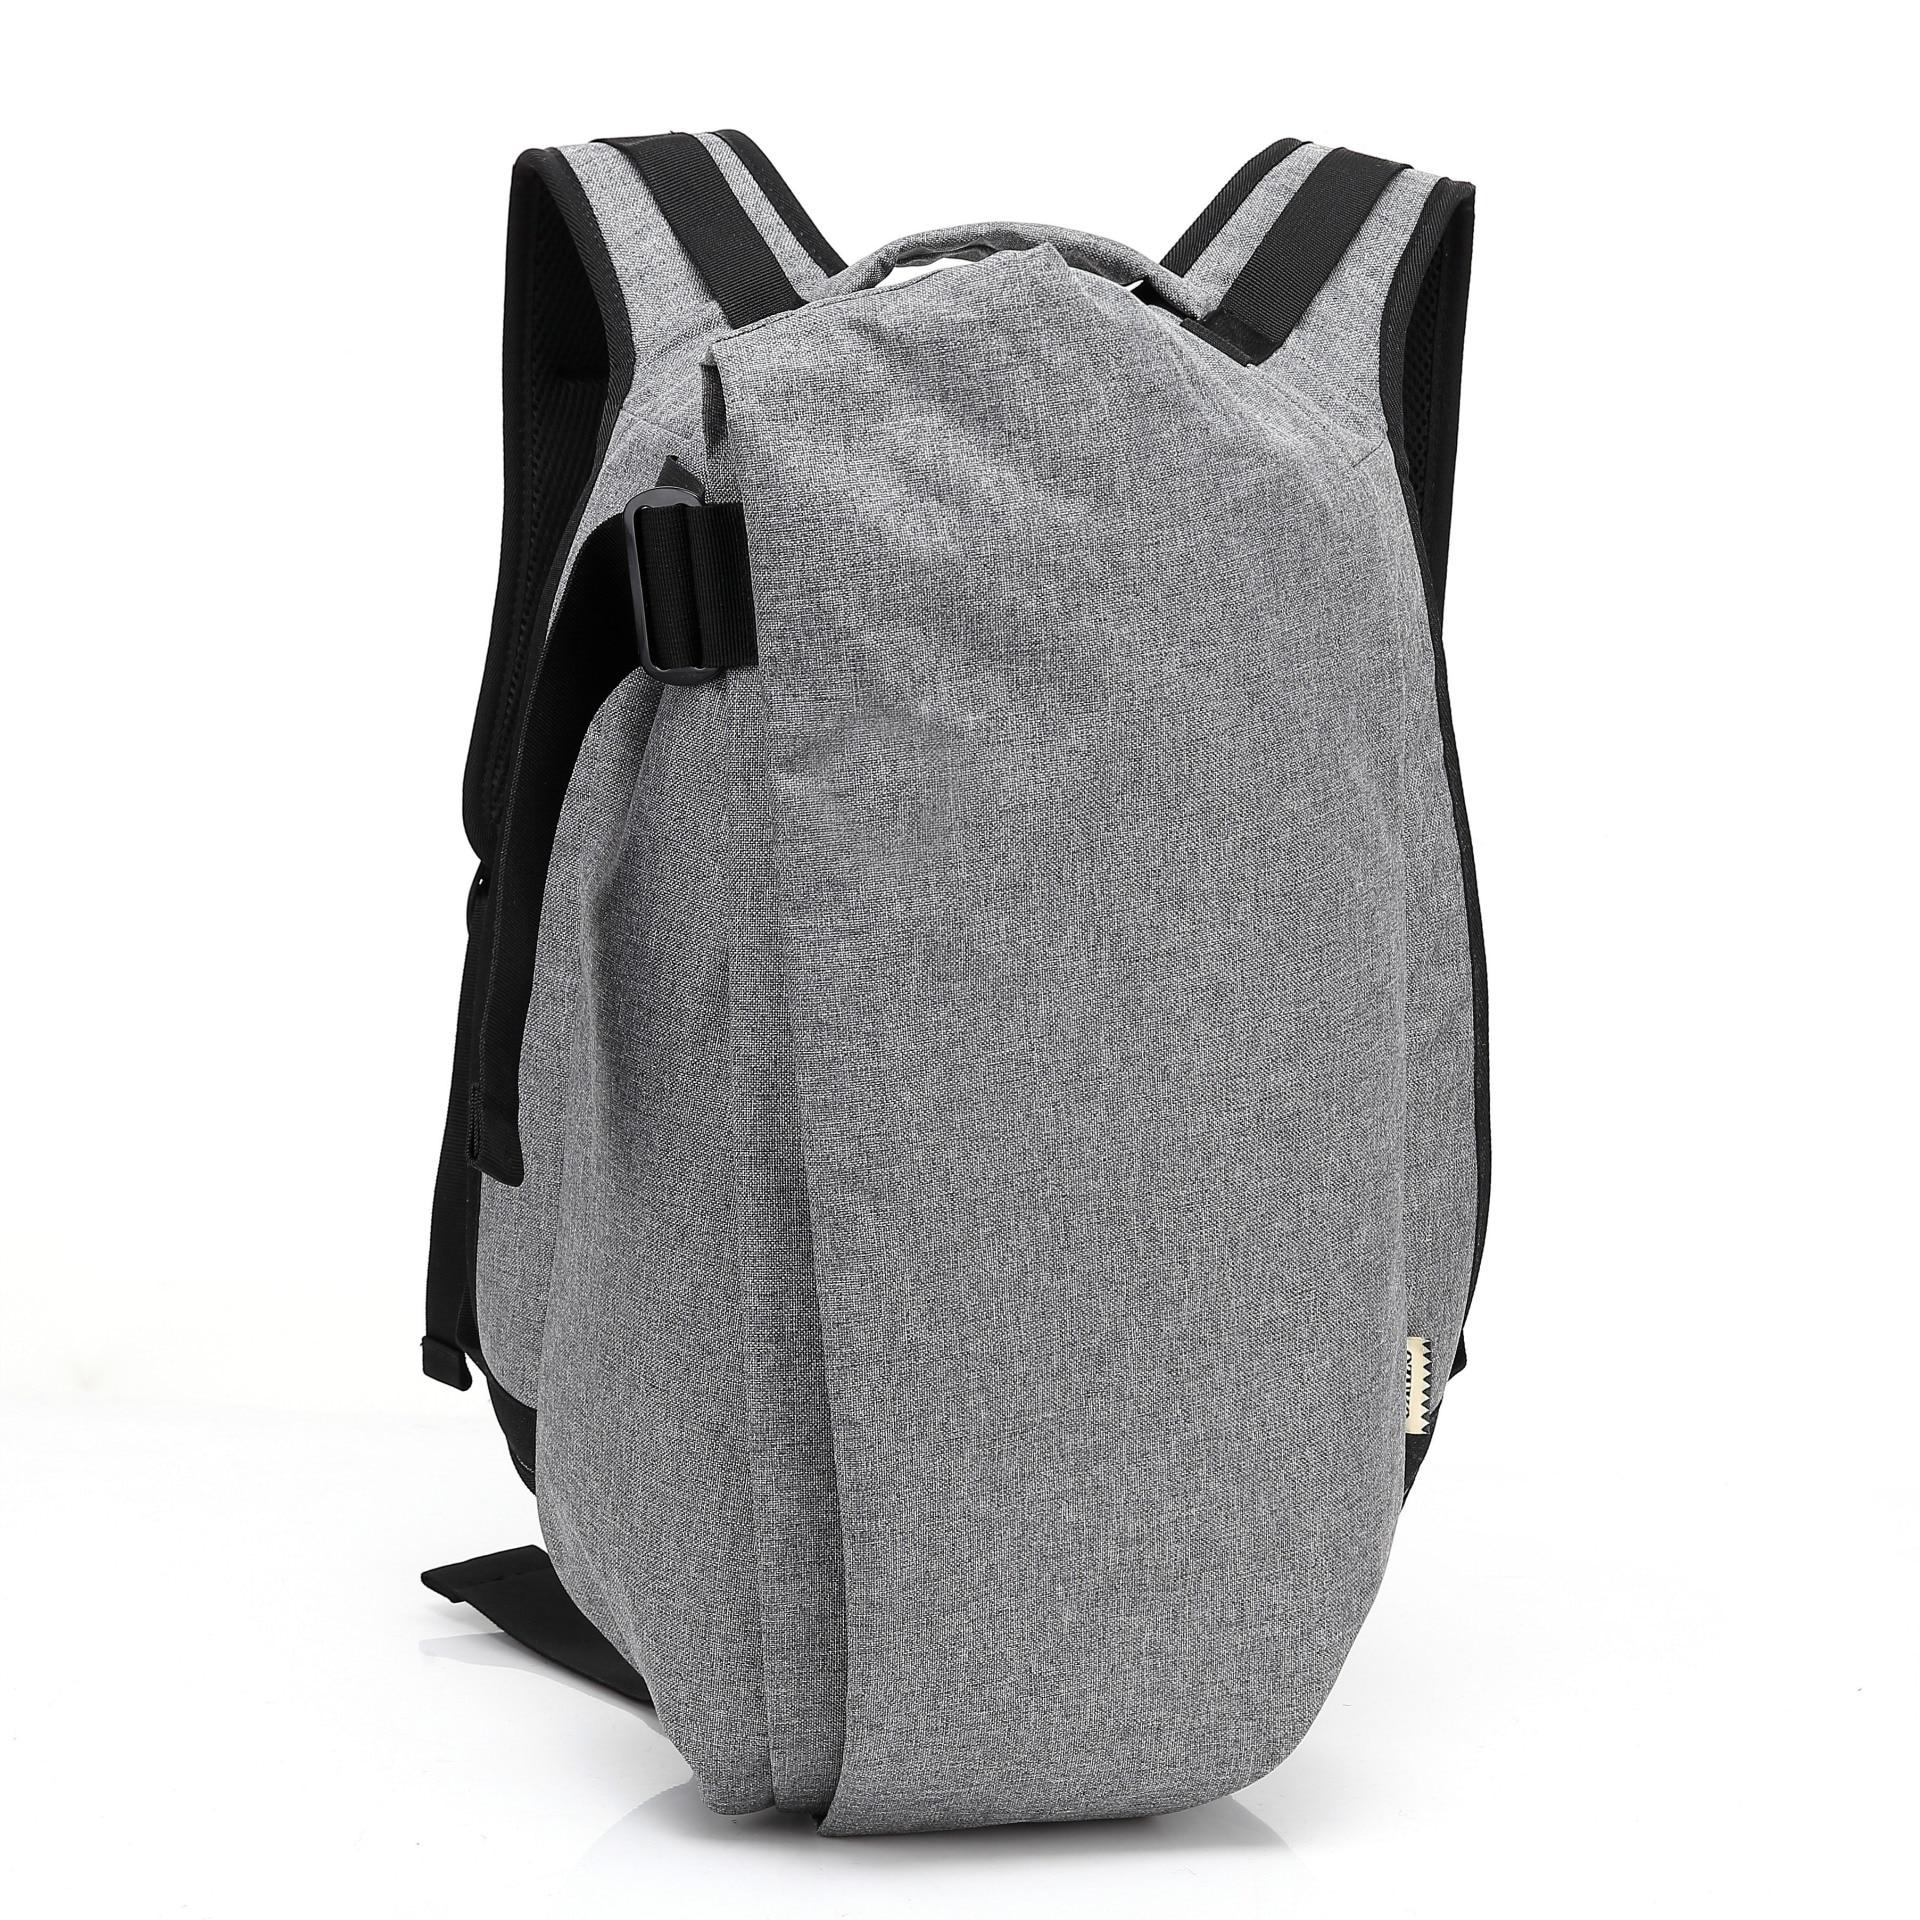 2018 new Men Anti Theft backpack USB charging Laptop Backpacks Teenagers School Male Mochila Travel backpack Back Pack Bag 30